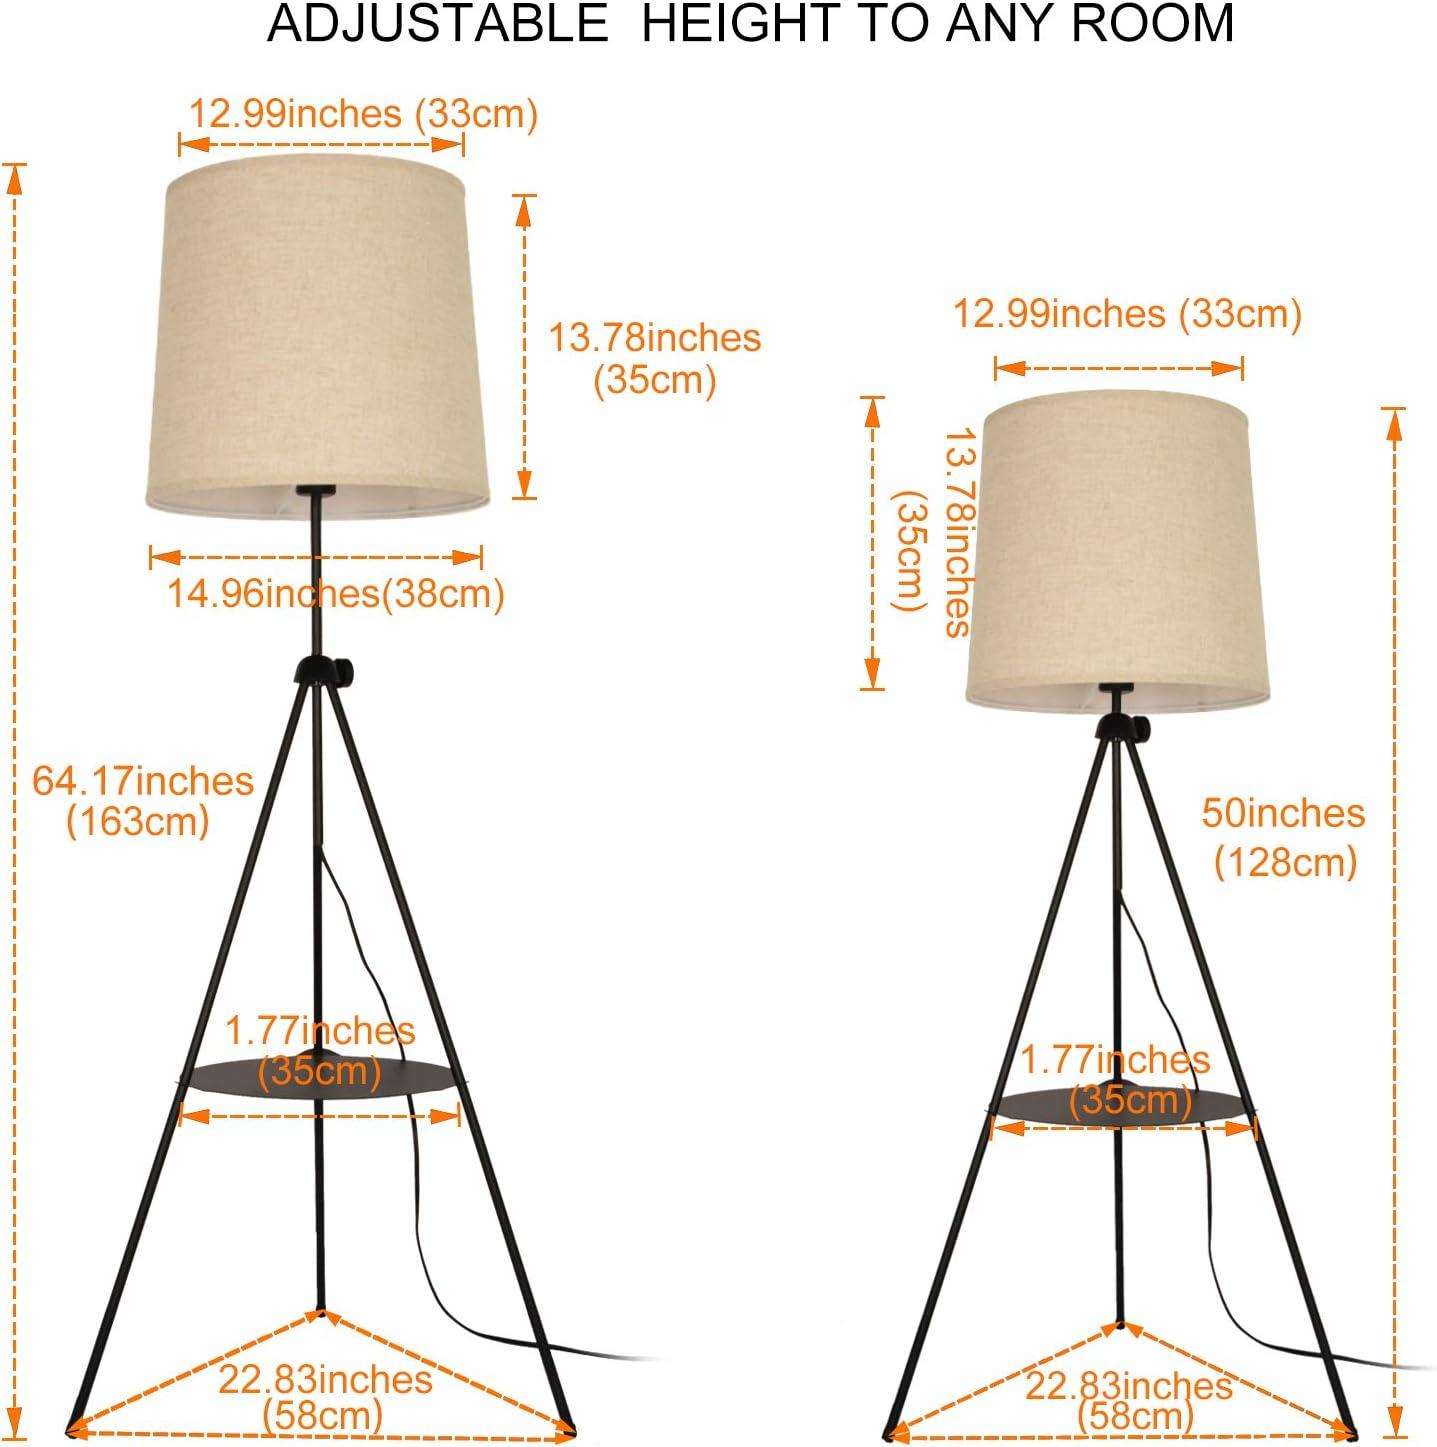 Tripod Floor Lamp with Shelves Beige Linen Lampshade Uplighter Nordic Modern Adjustable Standing Light E26 Bulb for Living Room Bedroom Office Contemporary Industrial Spotlight Black Metal Legs